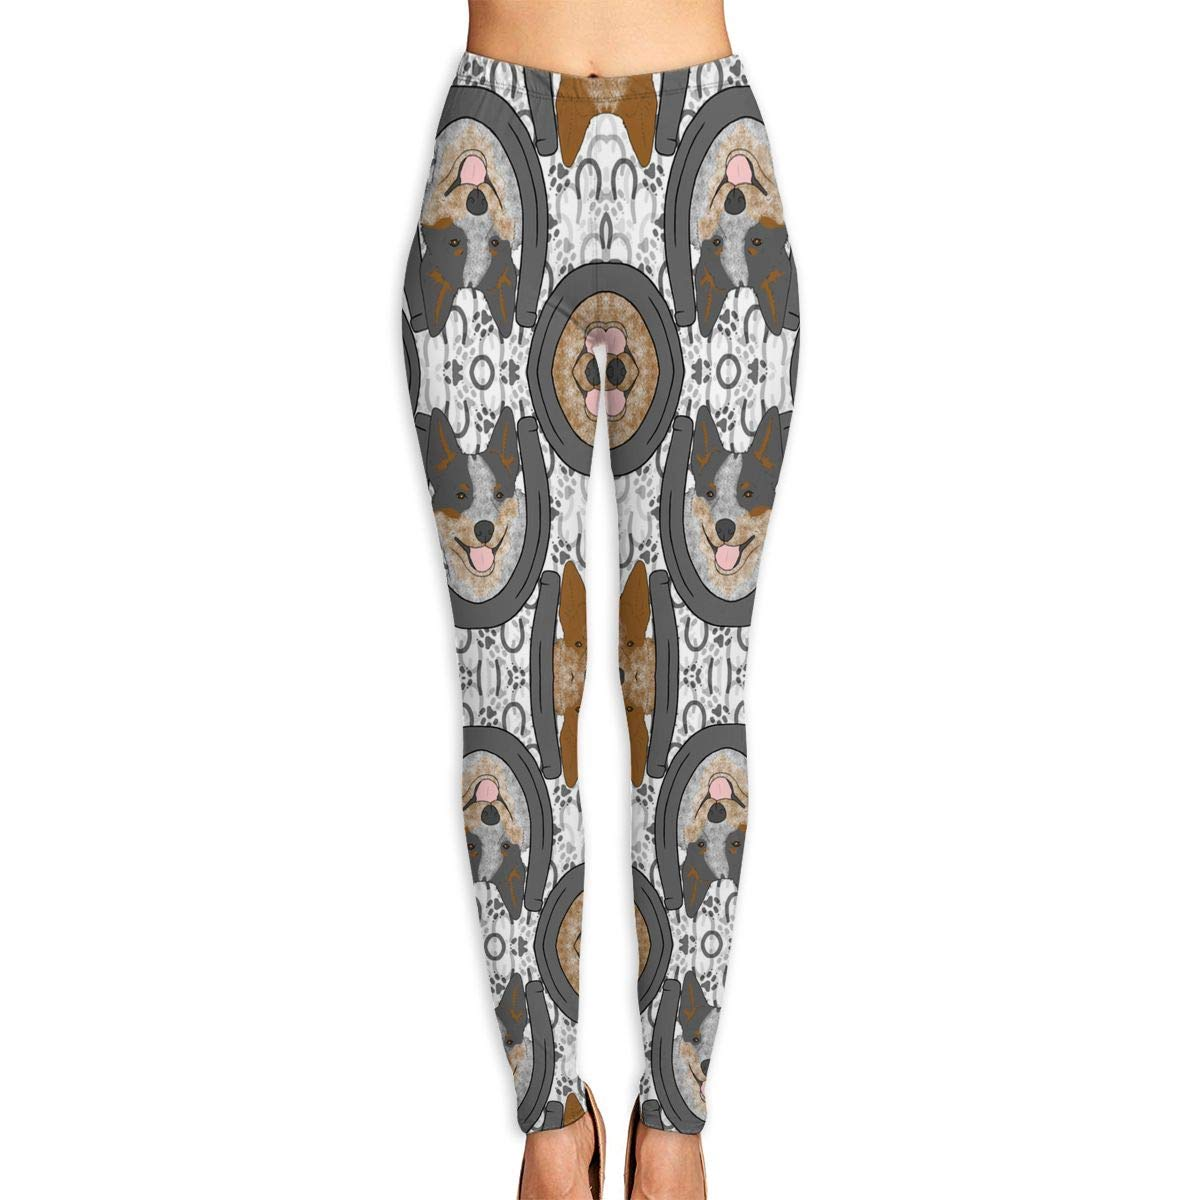 1e8a5fa6a859d5 Amazon.com : Hawxe-id Australian Cattle Dog Gym Yoga Pants High Waist Tummy  Control Workout Pants for Women Running Fitness Yoga Leggings : Sports & ...